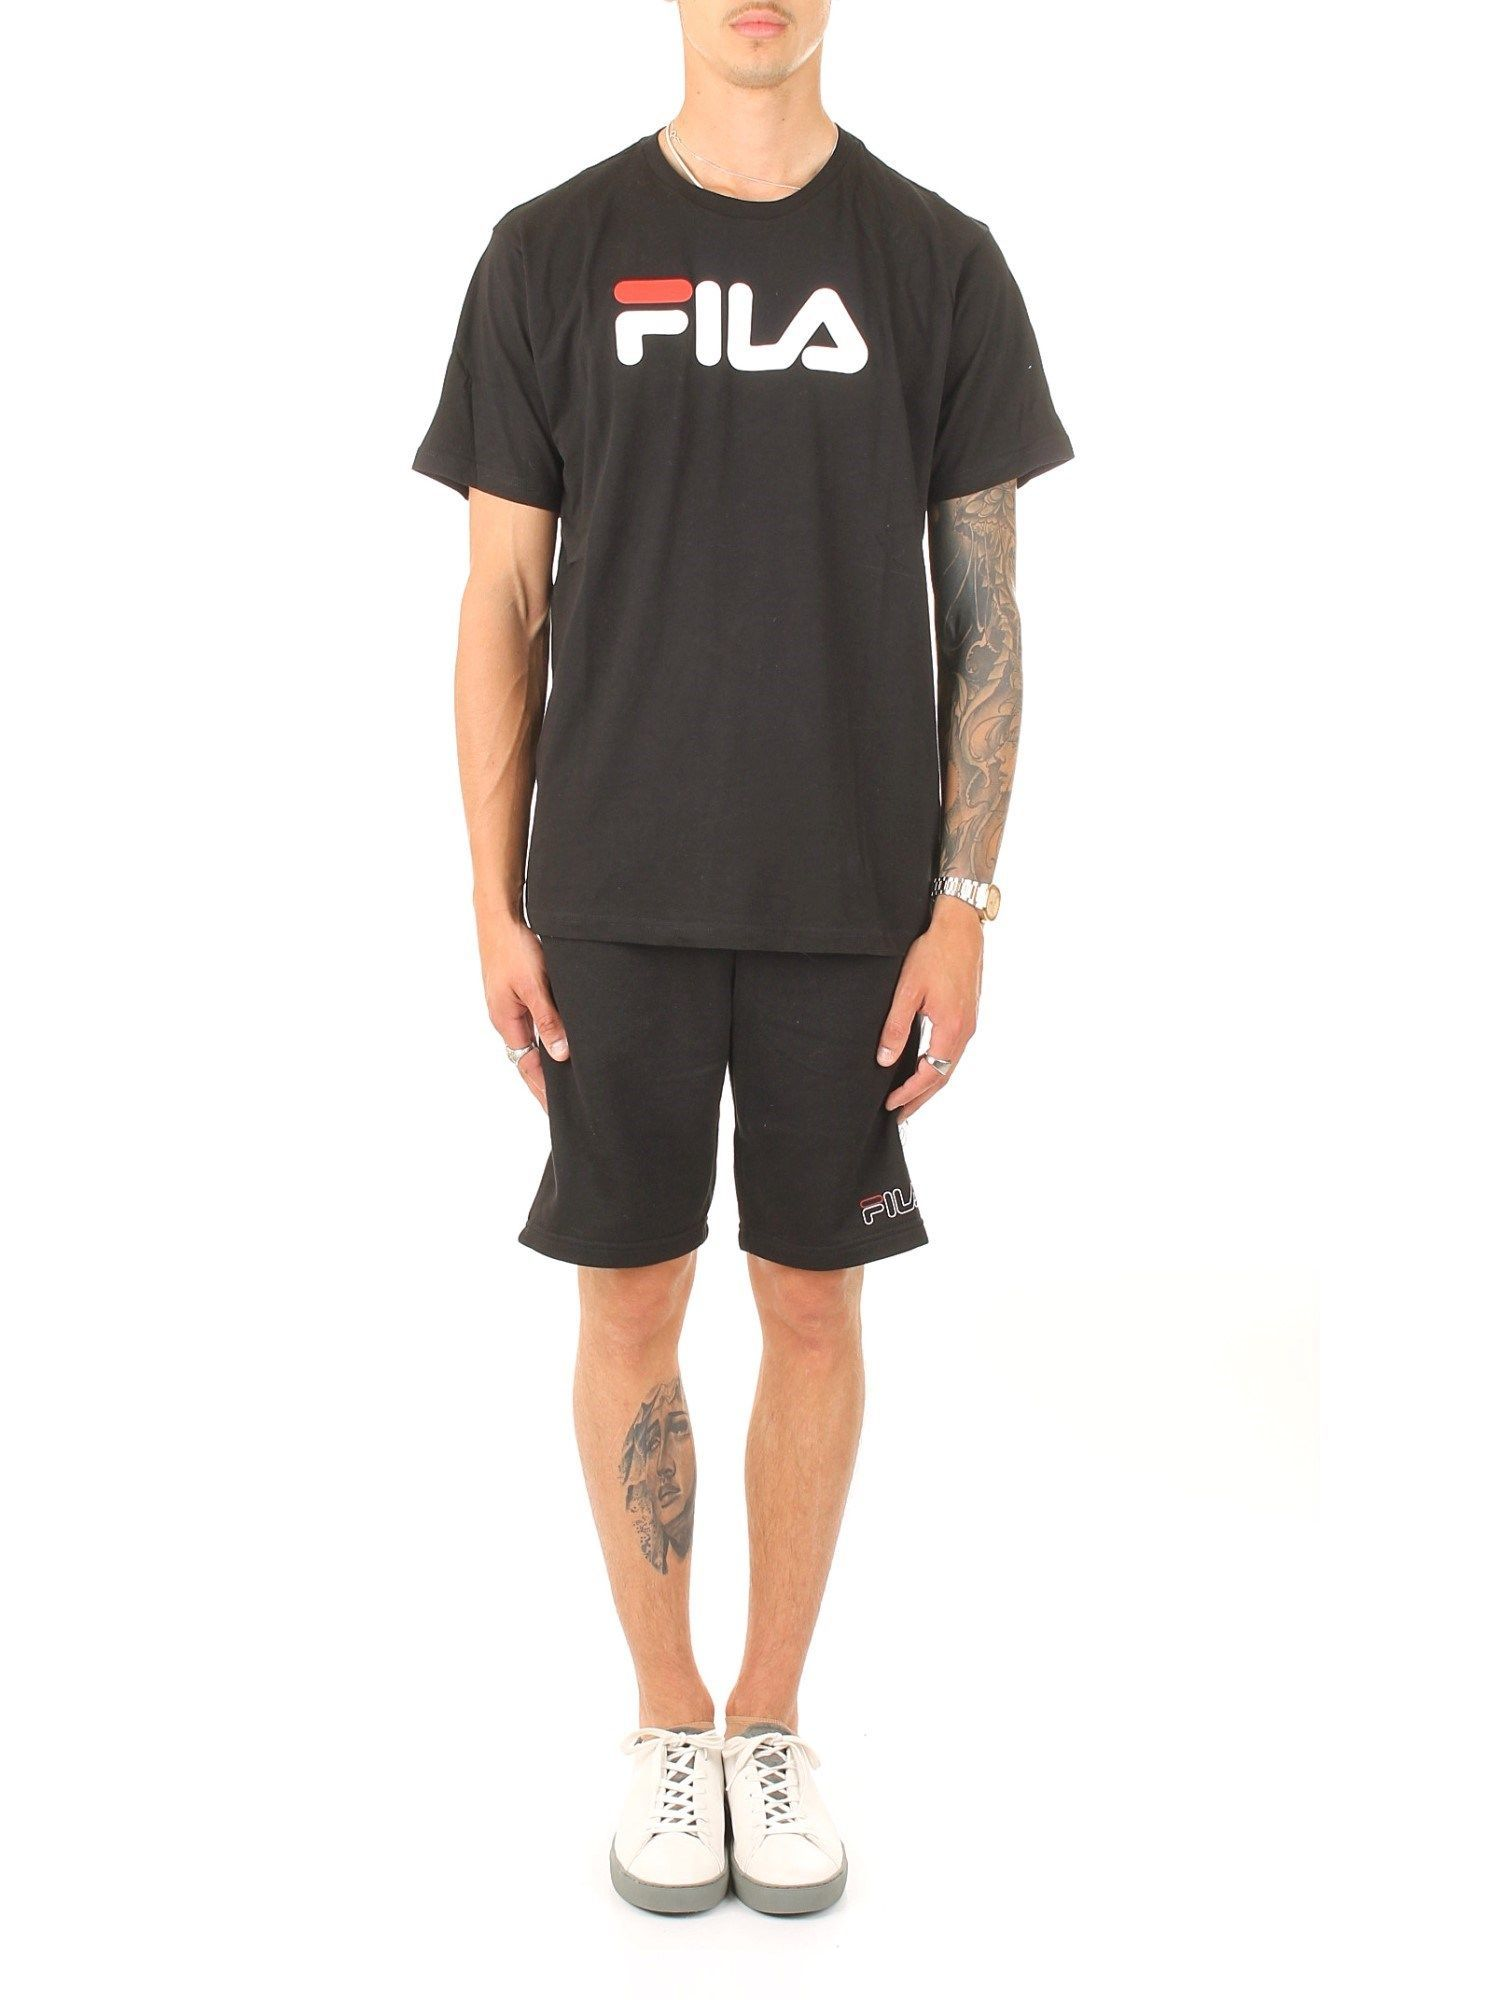 FILA  MEN'S 681093002 BLACK COTTON T-SHIRT